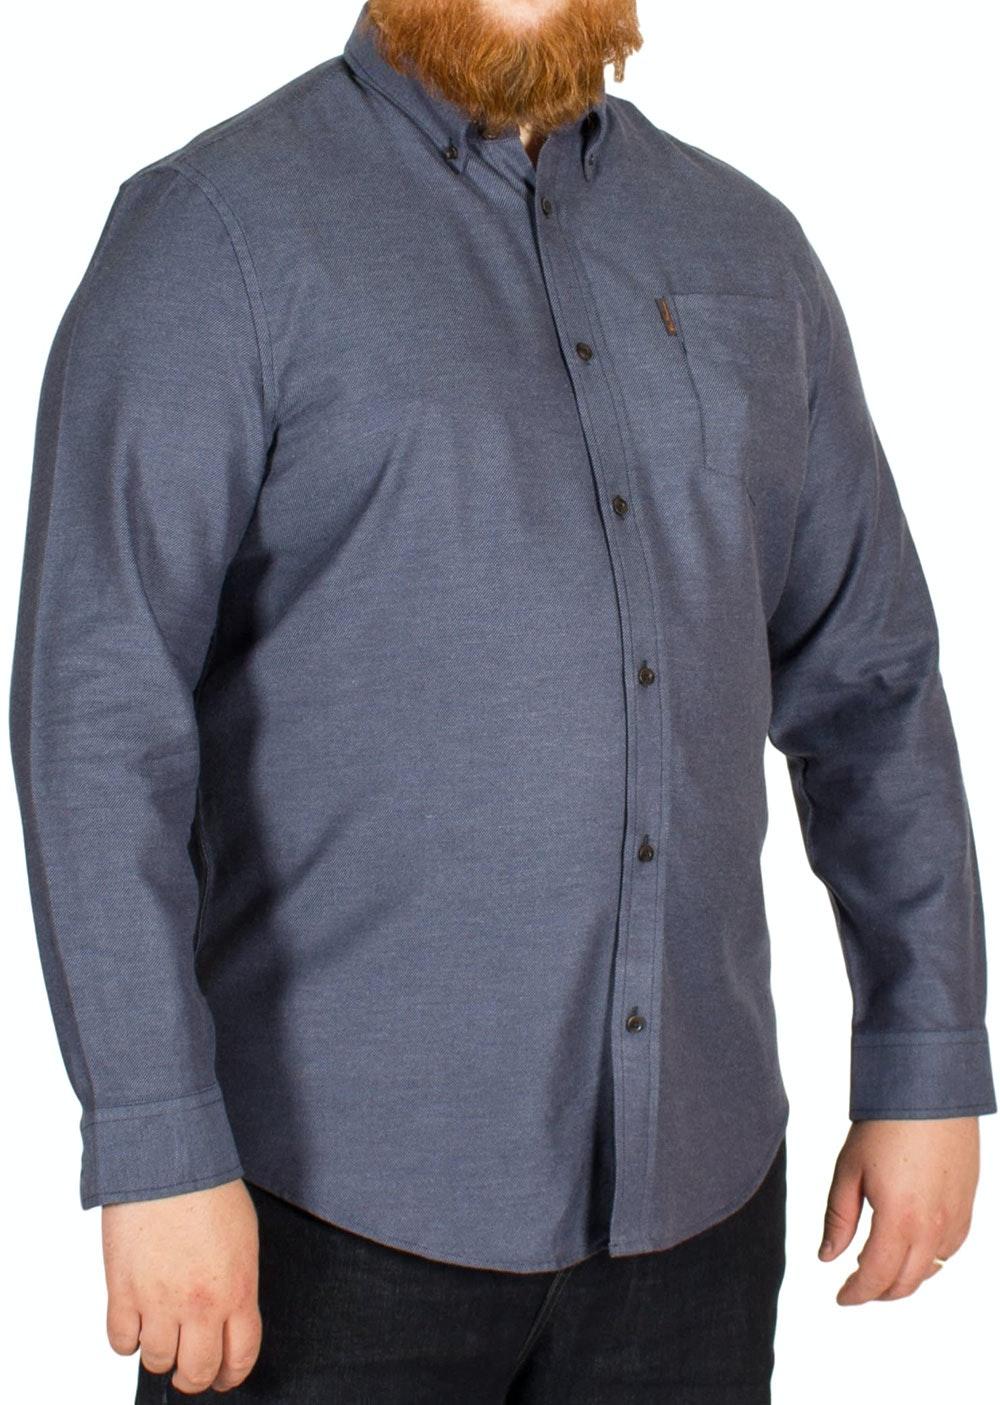 Ben Sherman Plain Twisted Cotton Shirt Indigo